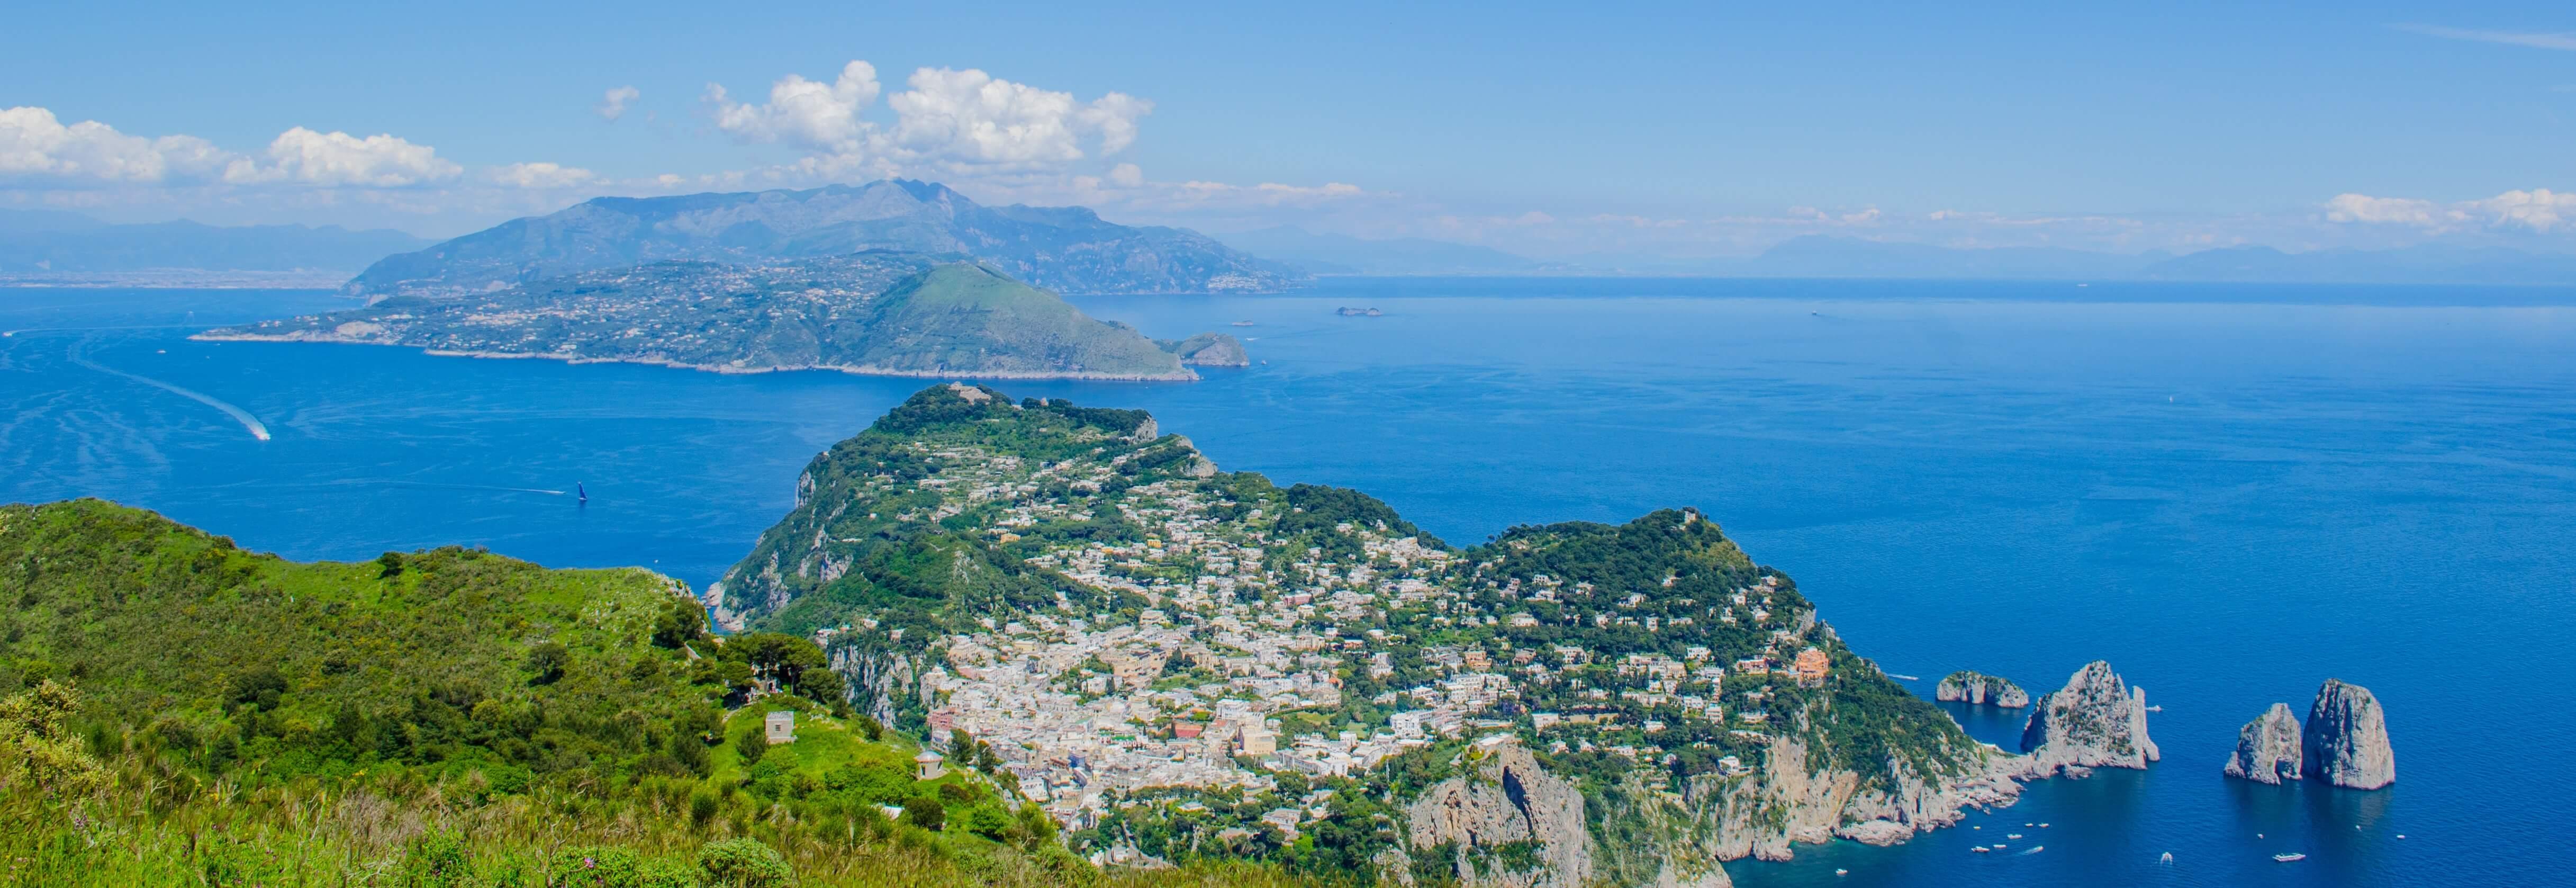 capri-yacht-charter-capri-yacht-rental-capri-boat-charter-capri-luxury-boat-capri-boat-hire-capri-boat-charter-capri-island